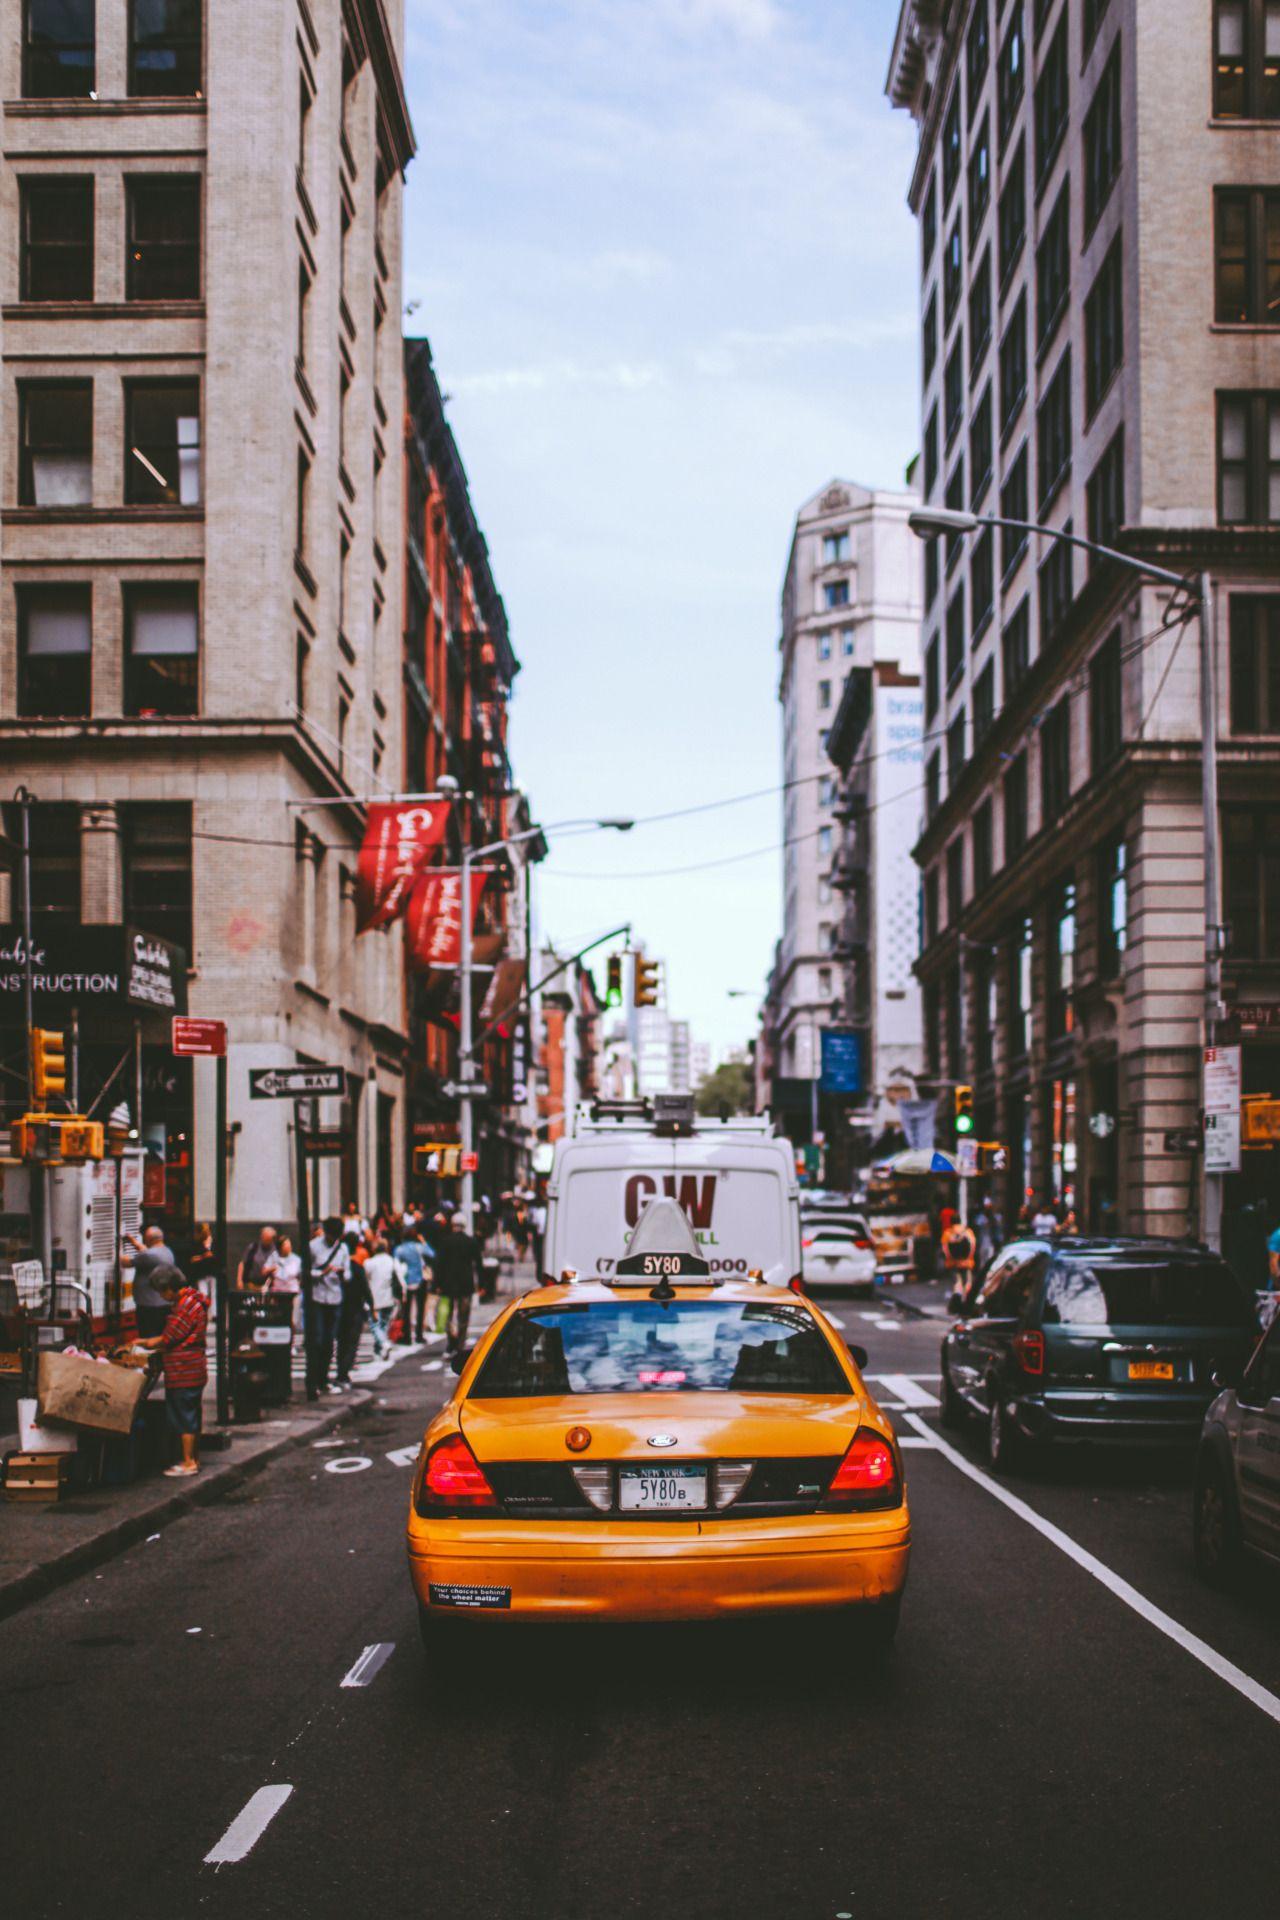 Soho New York City by @nowyourecool #newyorkcityfeelings #nyc #newyork